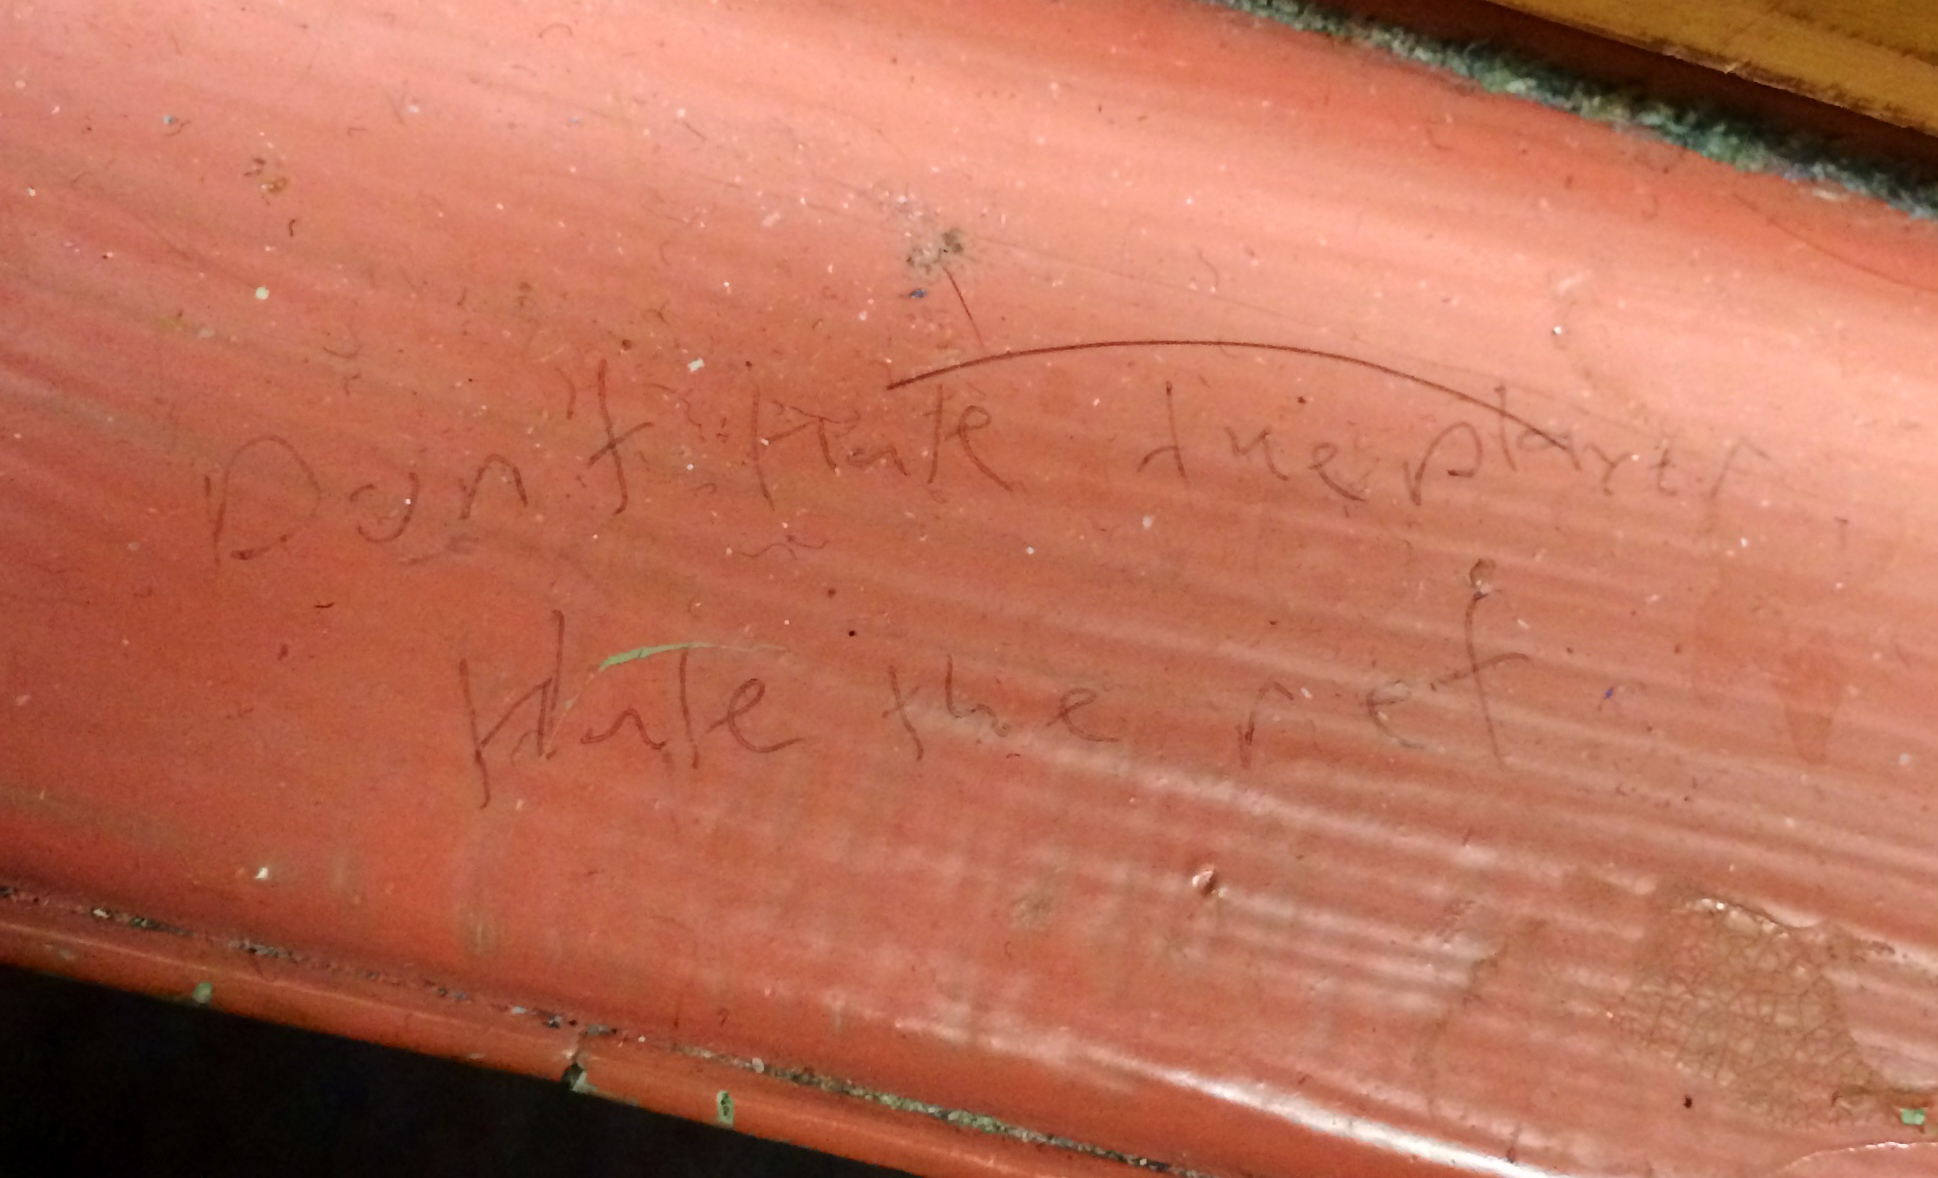 Library Graffiti